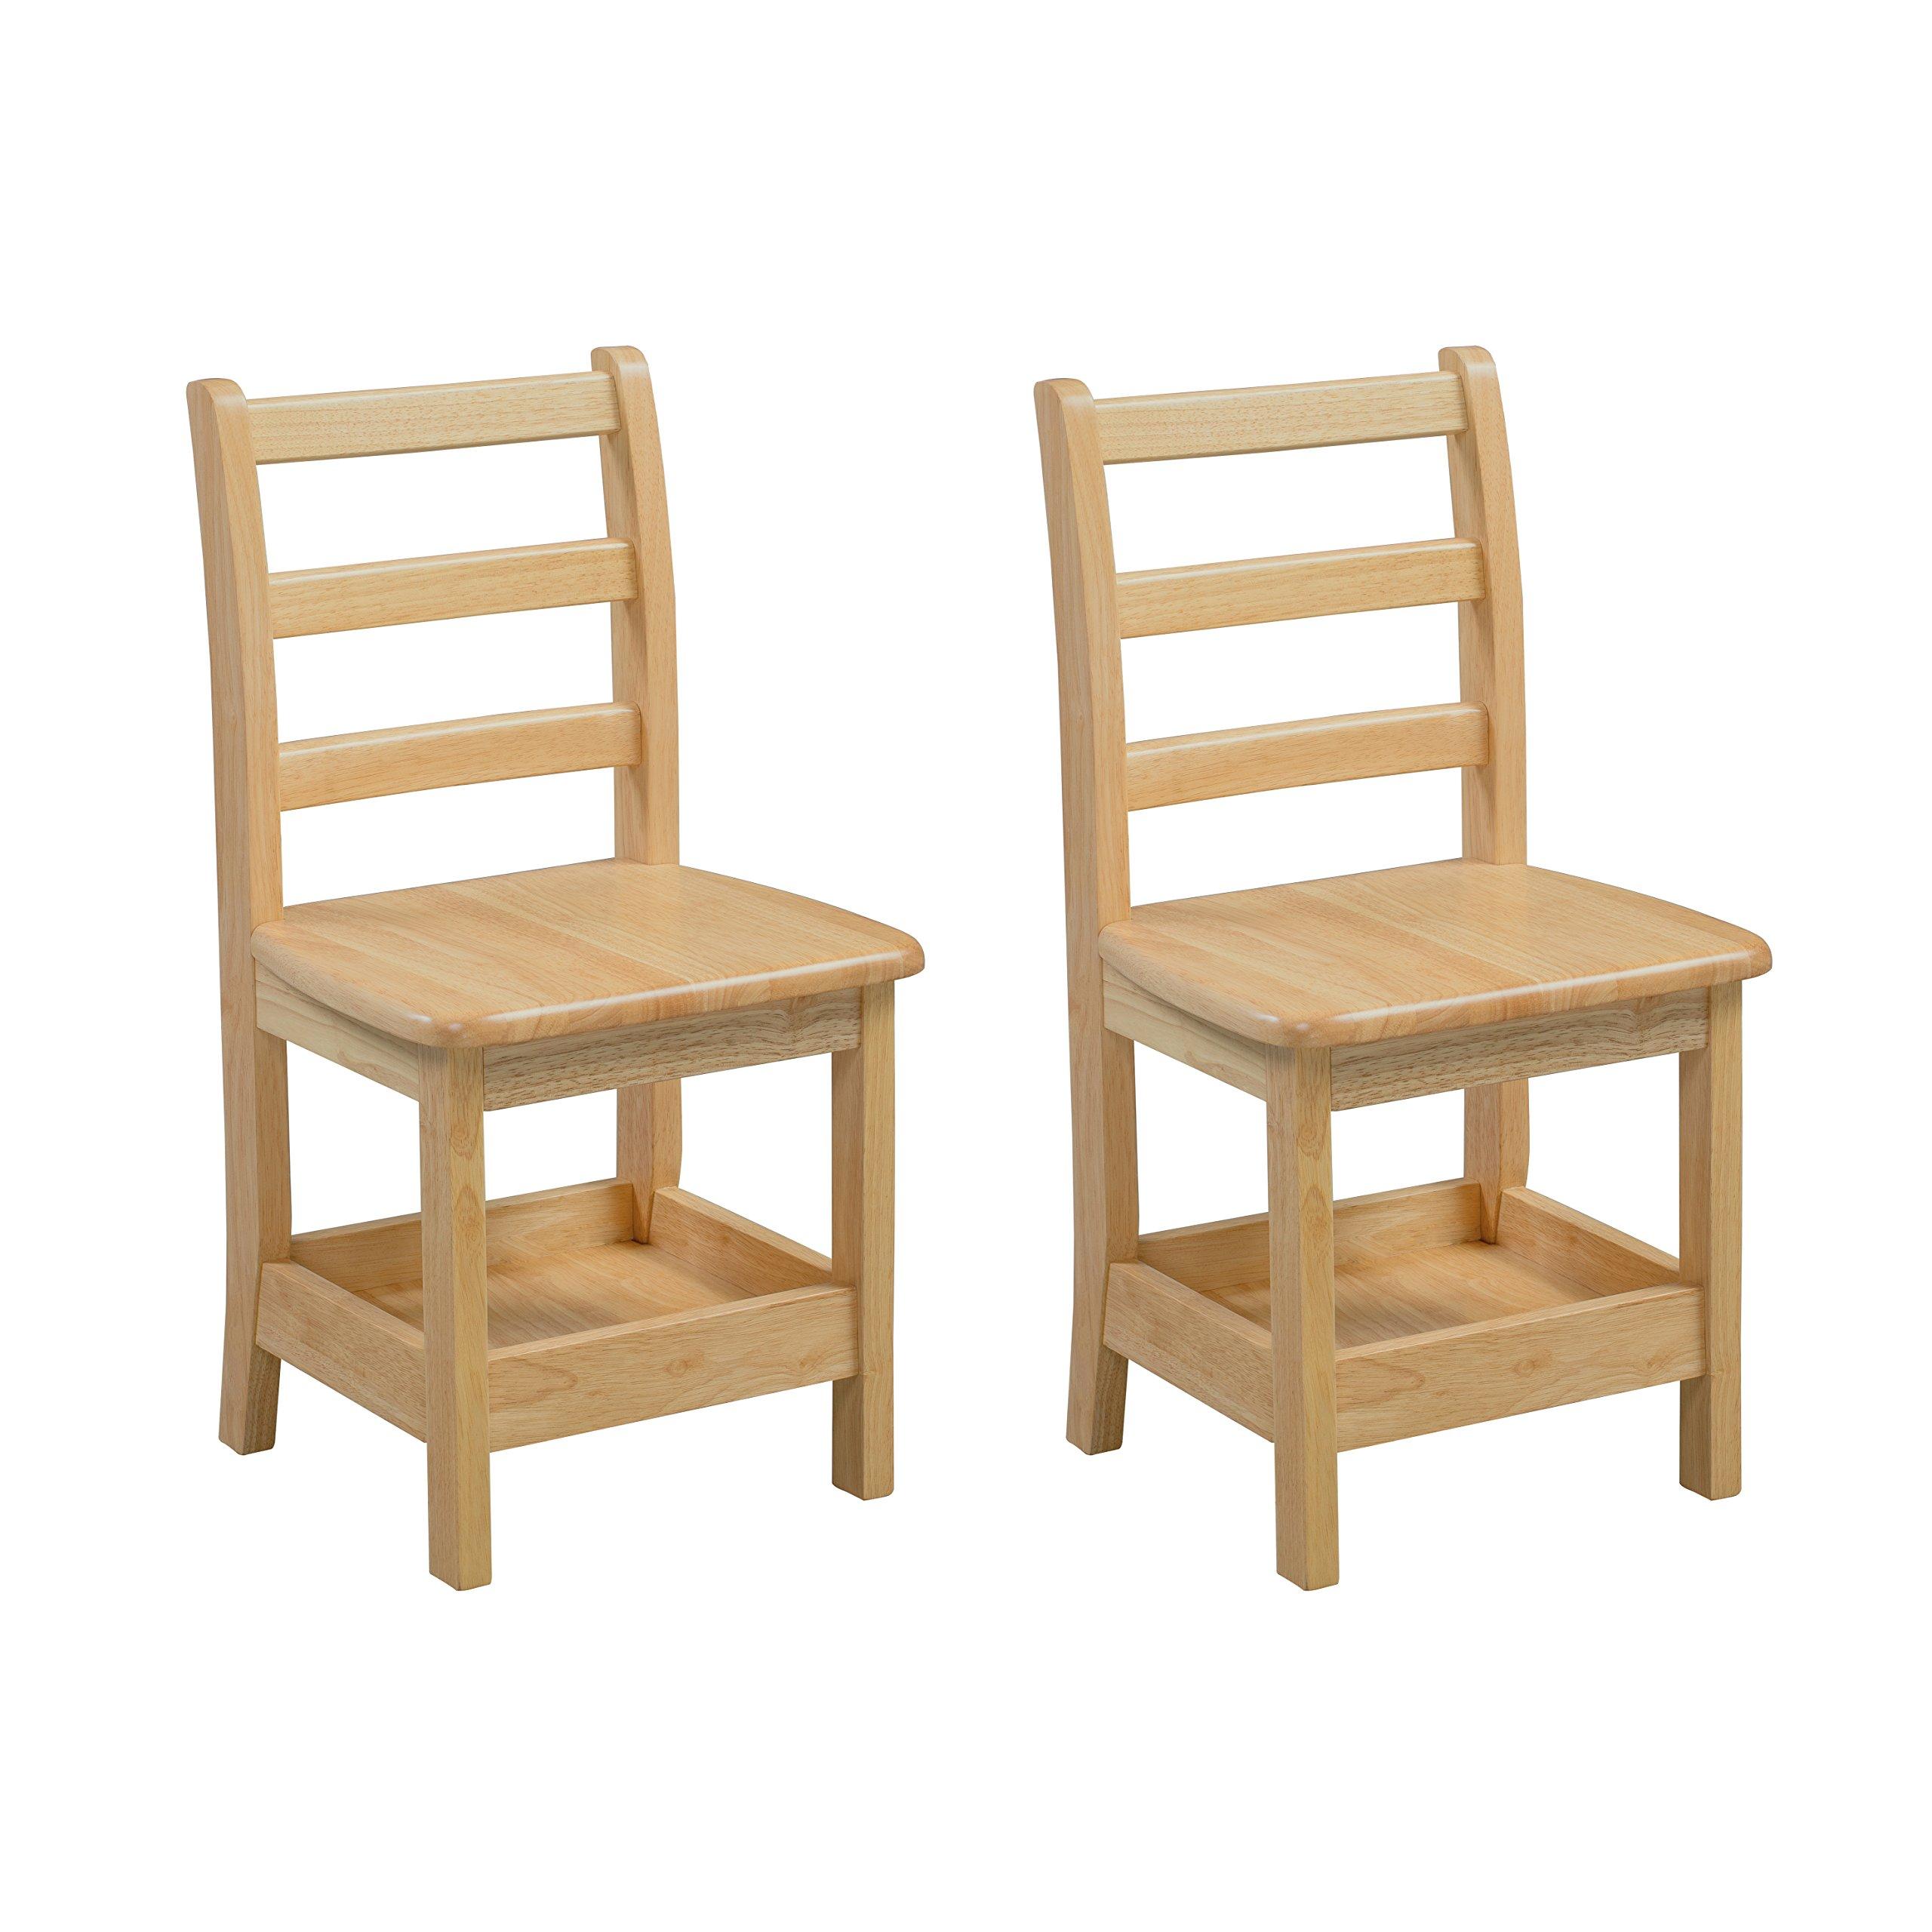 ECR4Kids Sit n' Stash Solid Wood 14 inch Kids Chair with Storage (2-Pack)